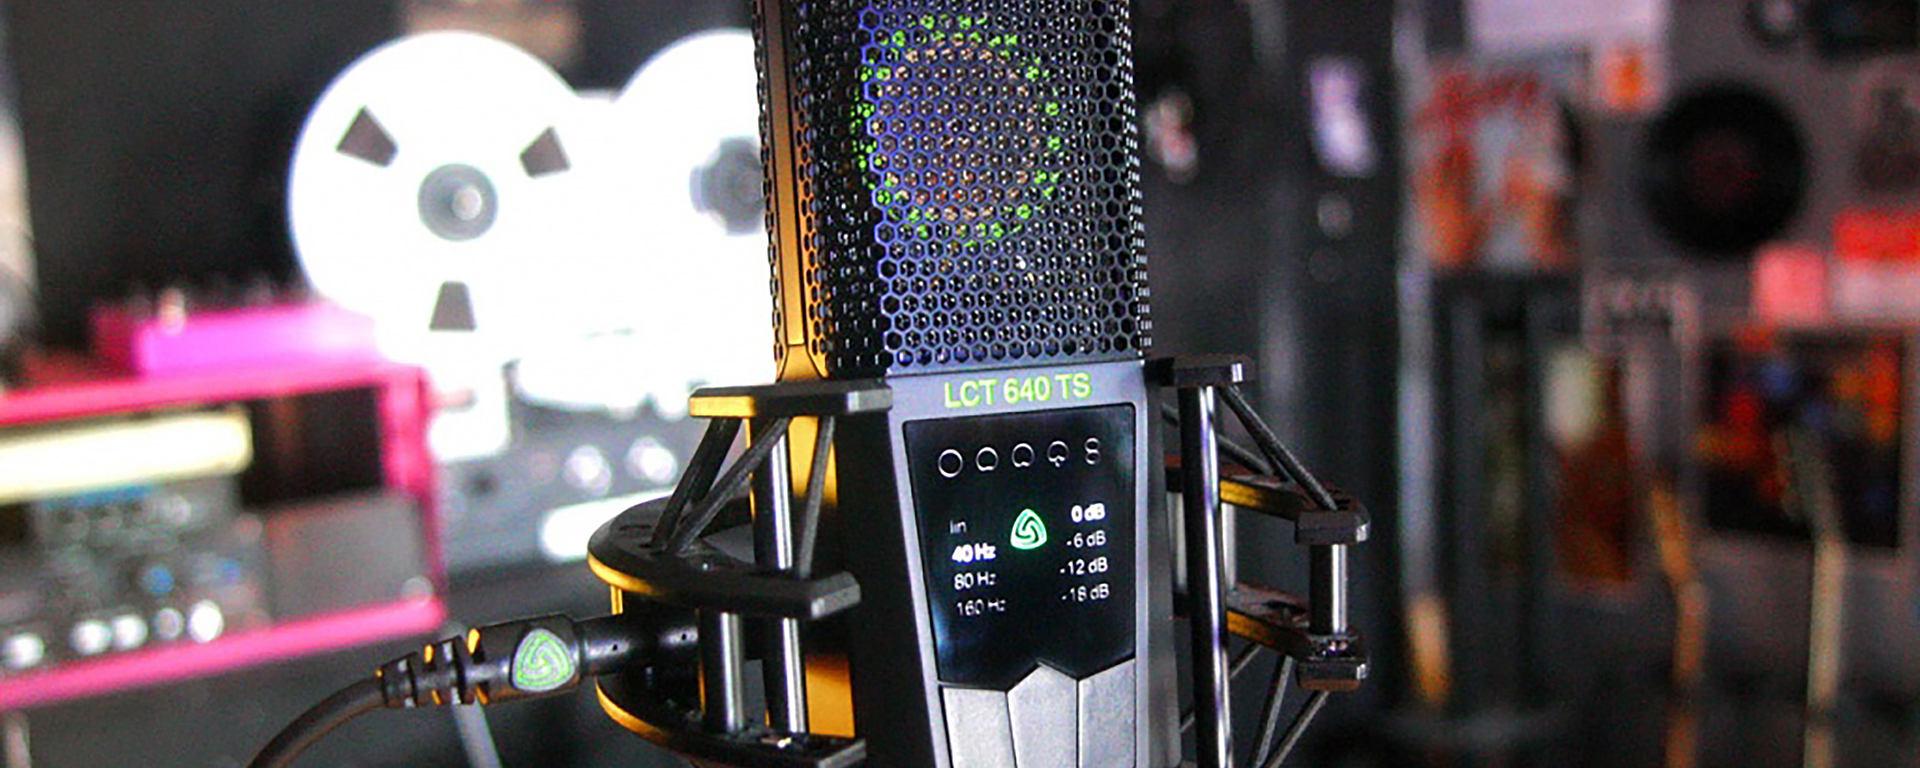 LCT 640 TS large diaphragm studio condenser microphone